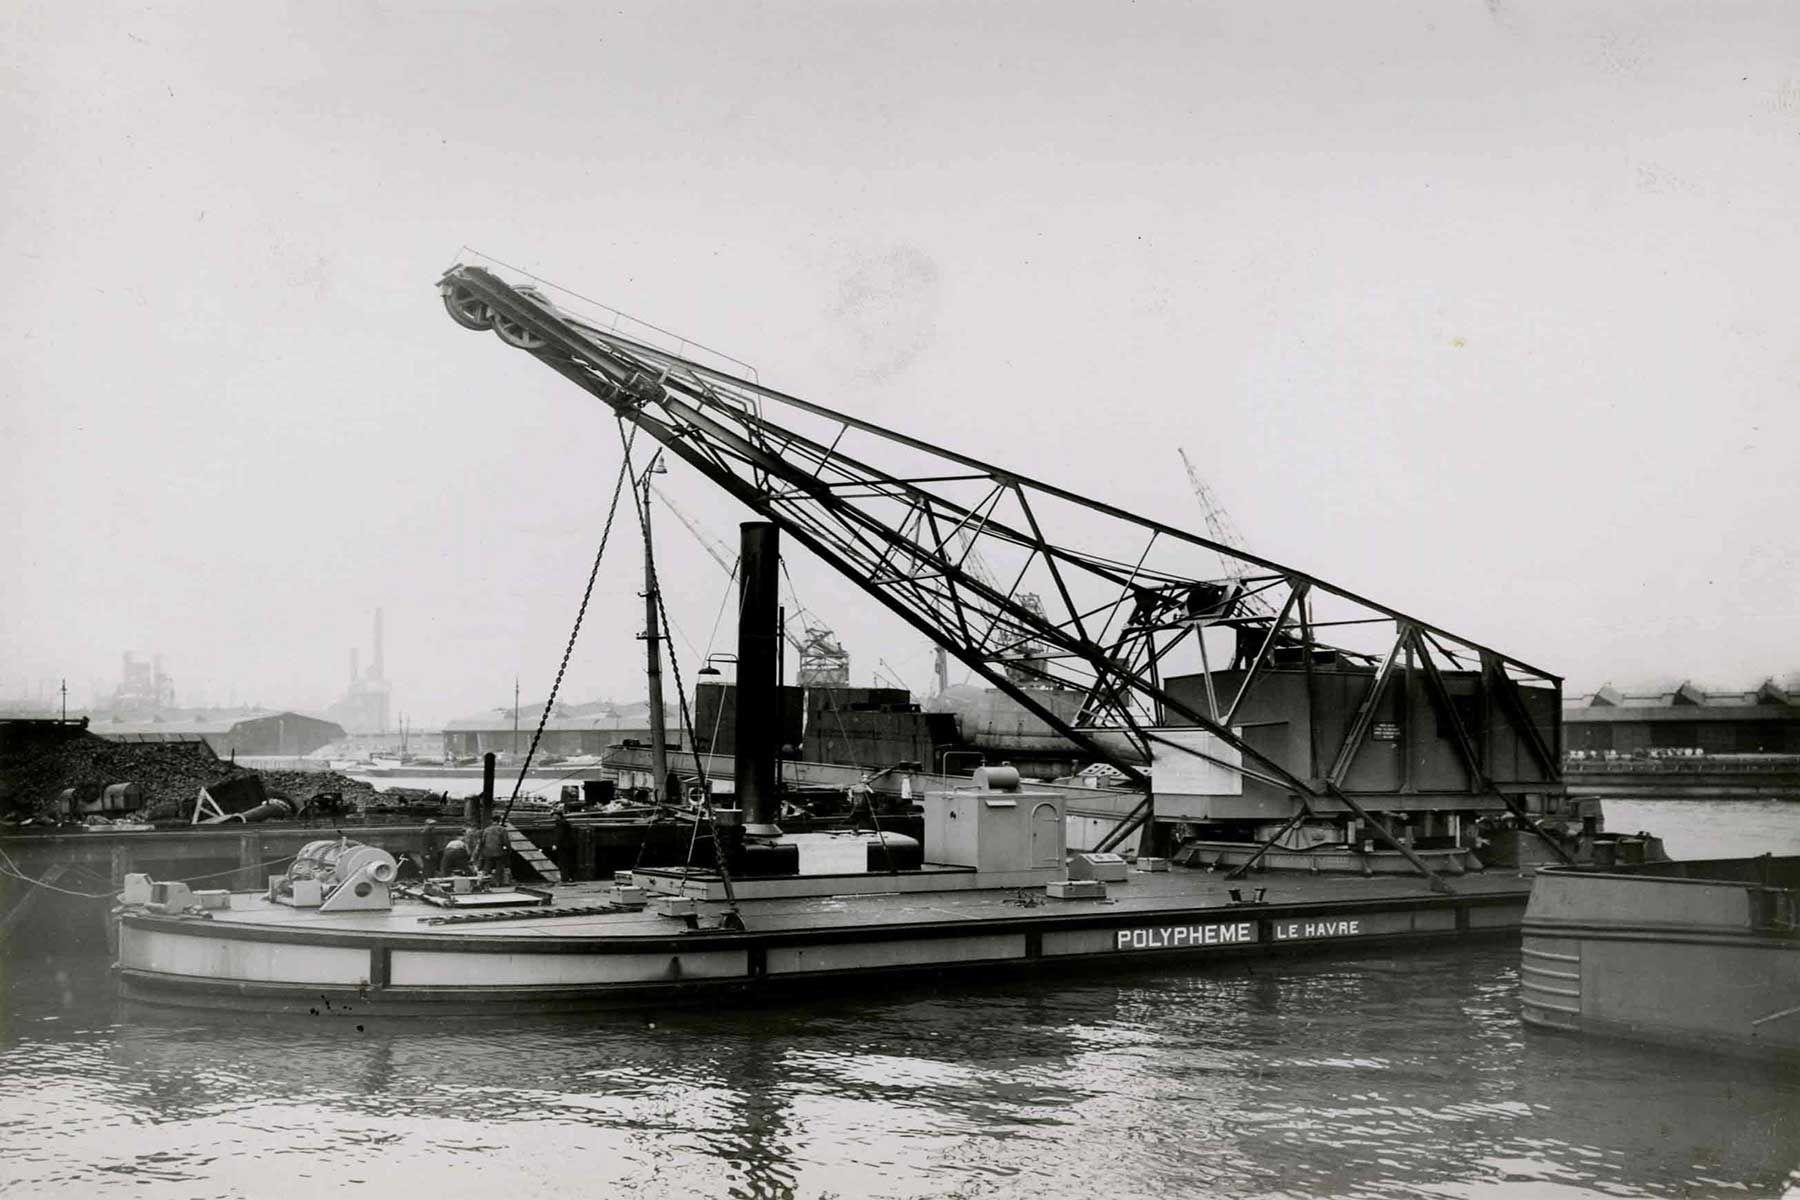 Bnr. 668 (1931) 'Polypheme' 20 ton foto: Gem. archief Schiedam / Werf Gusto fotograaf: Onbekend